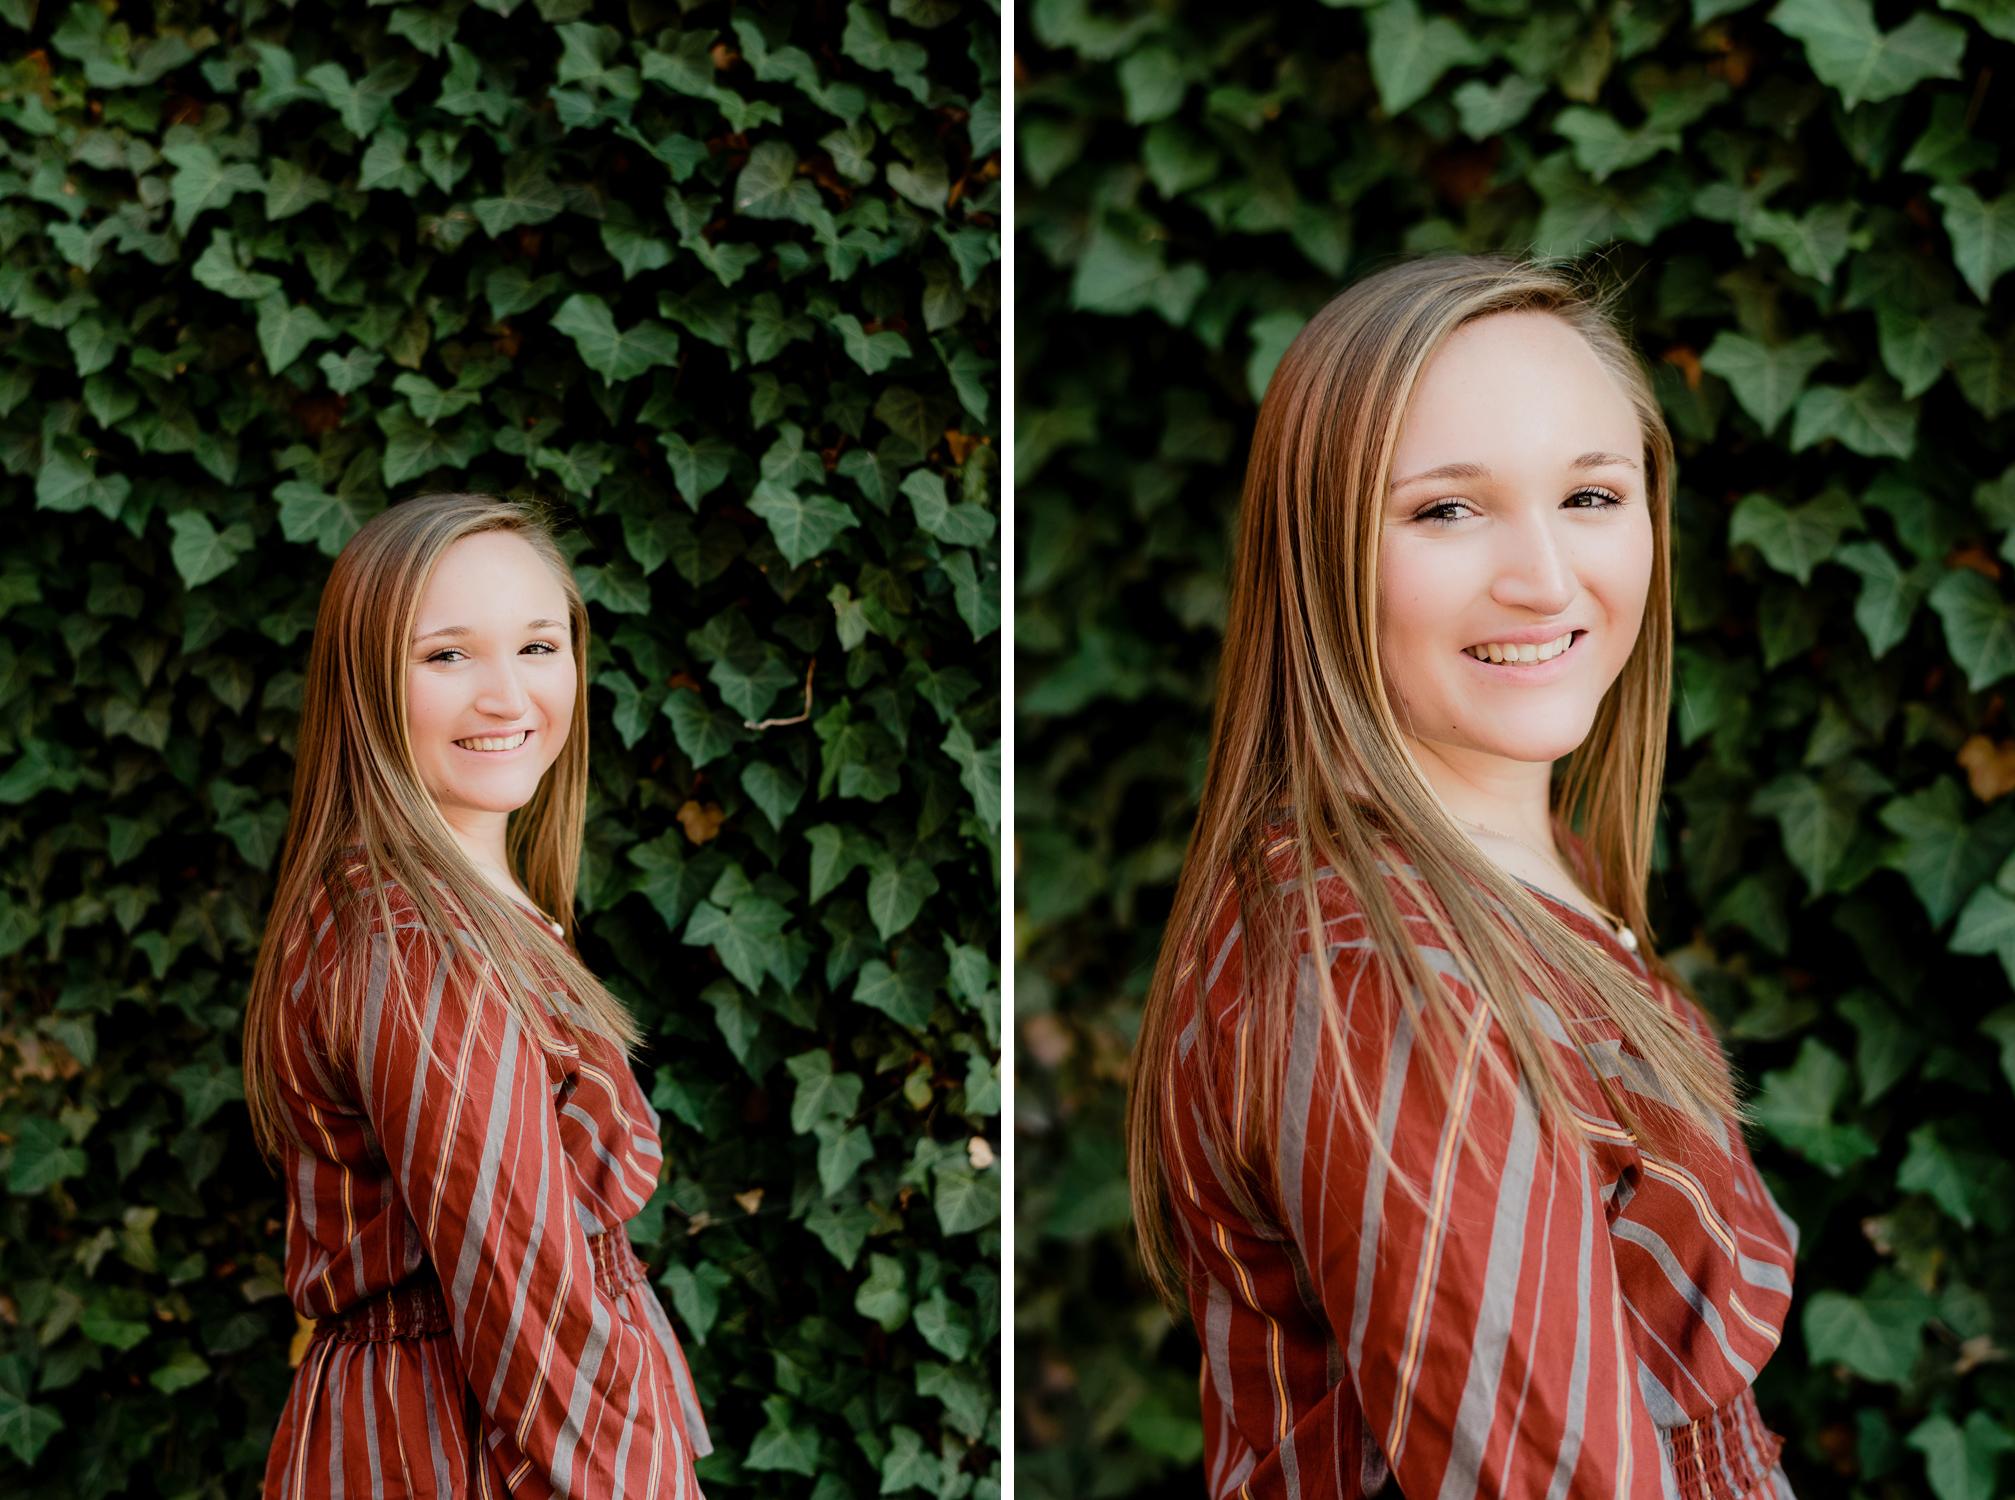 holland-michigan-high-school-senior-portrait-photographer (90).jpg